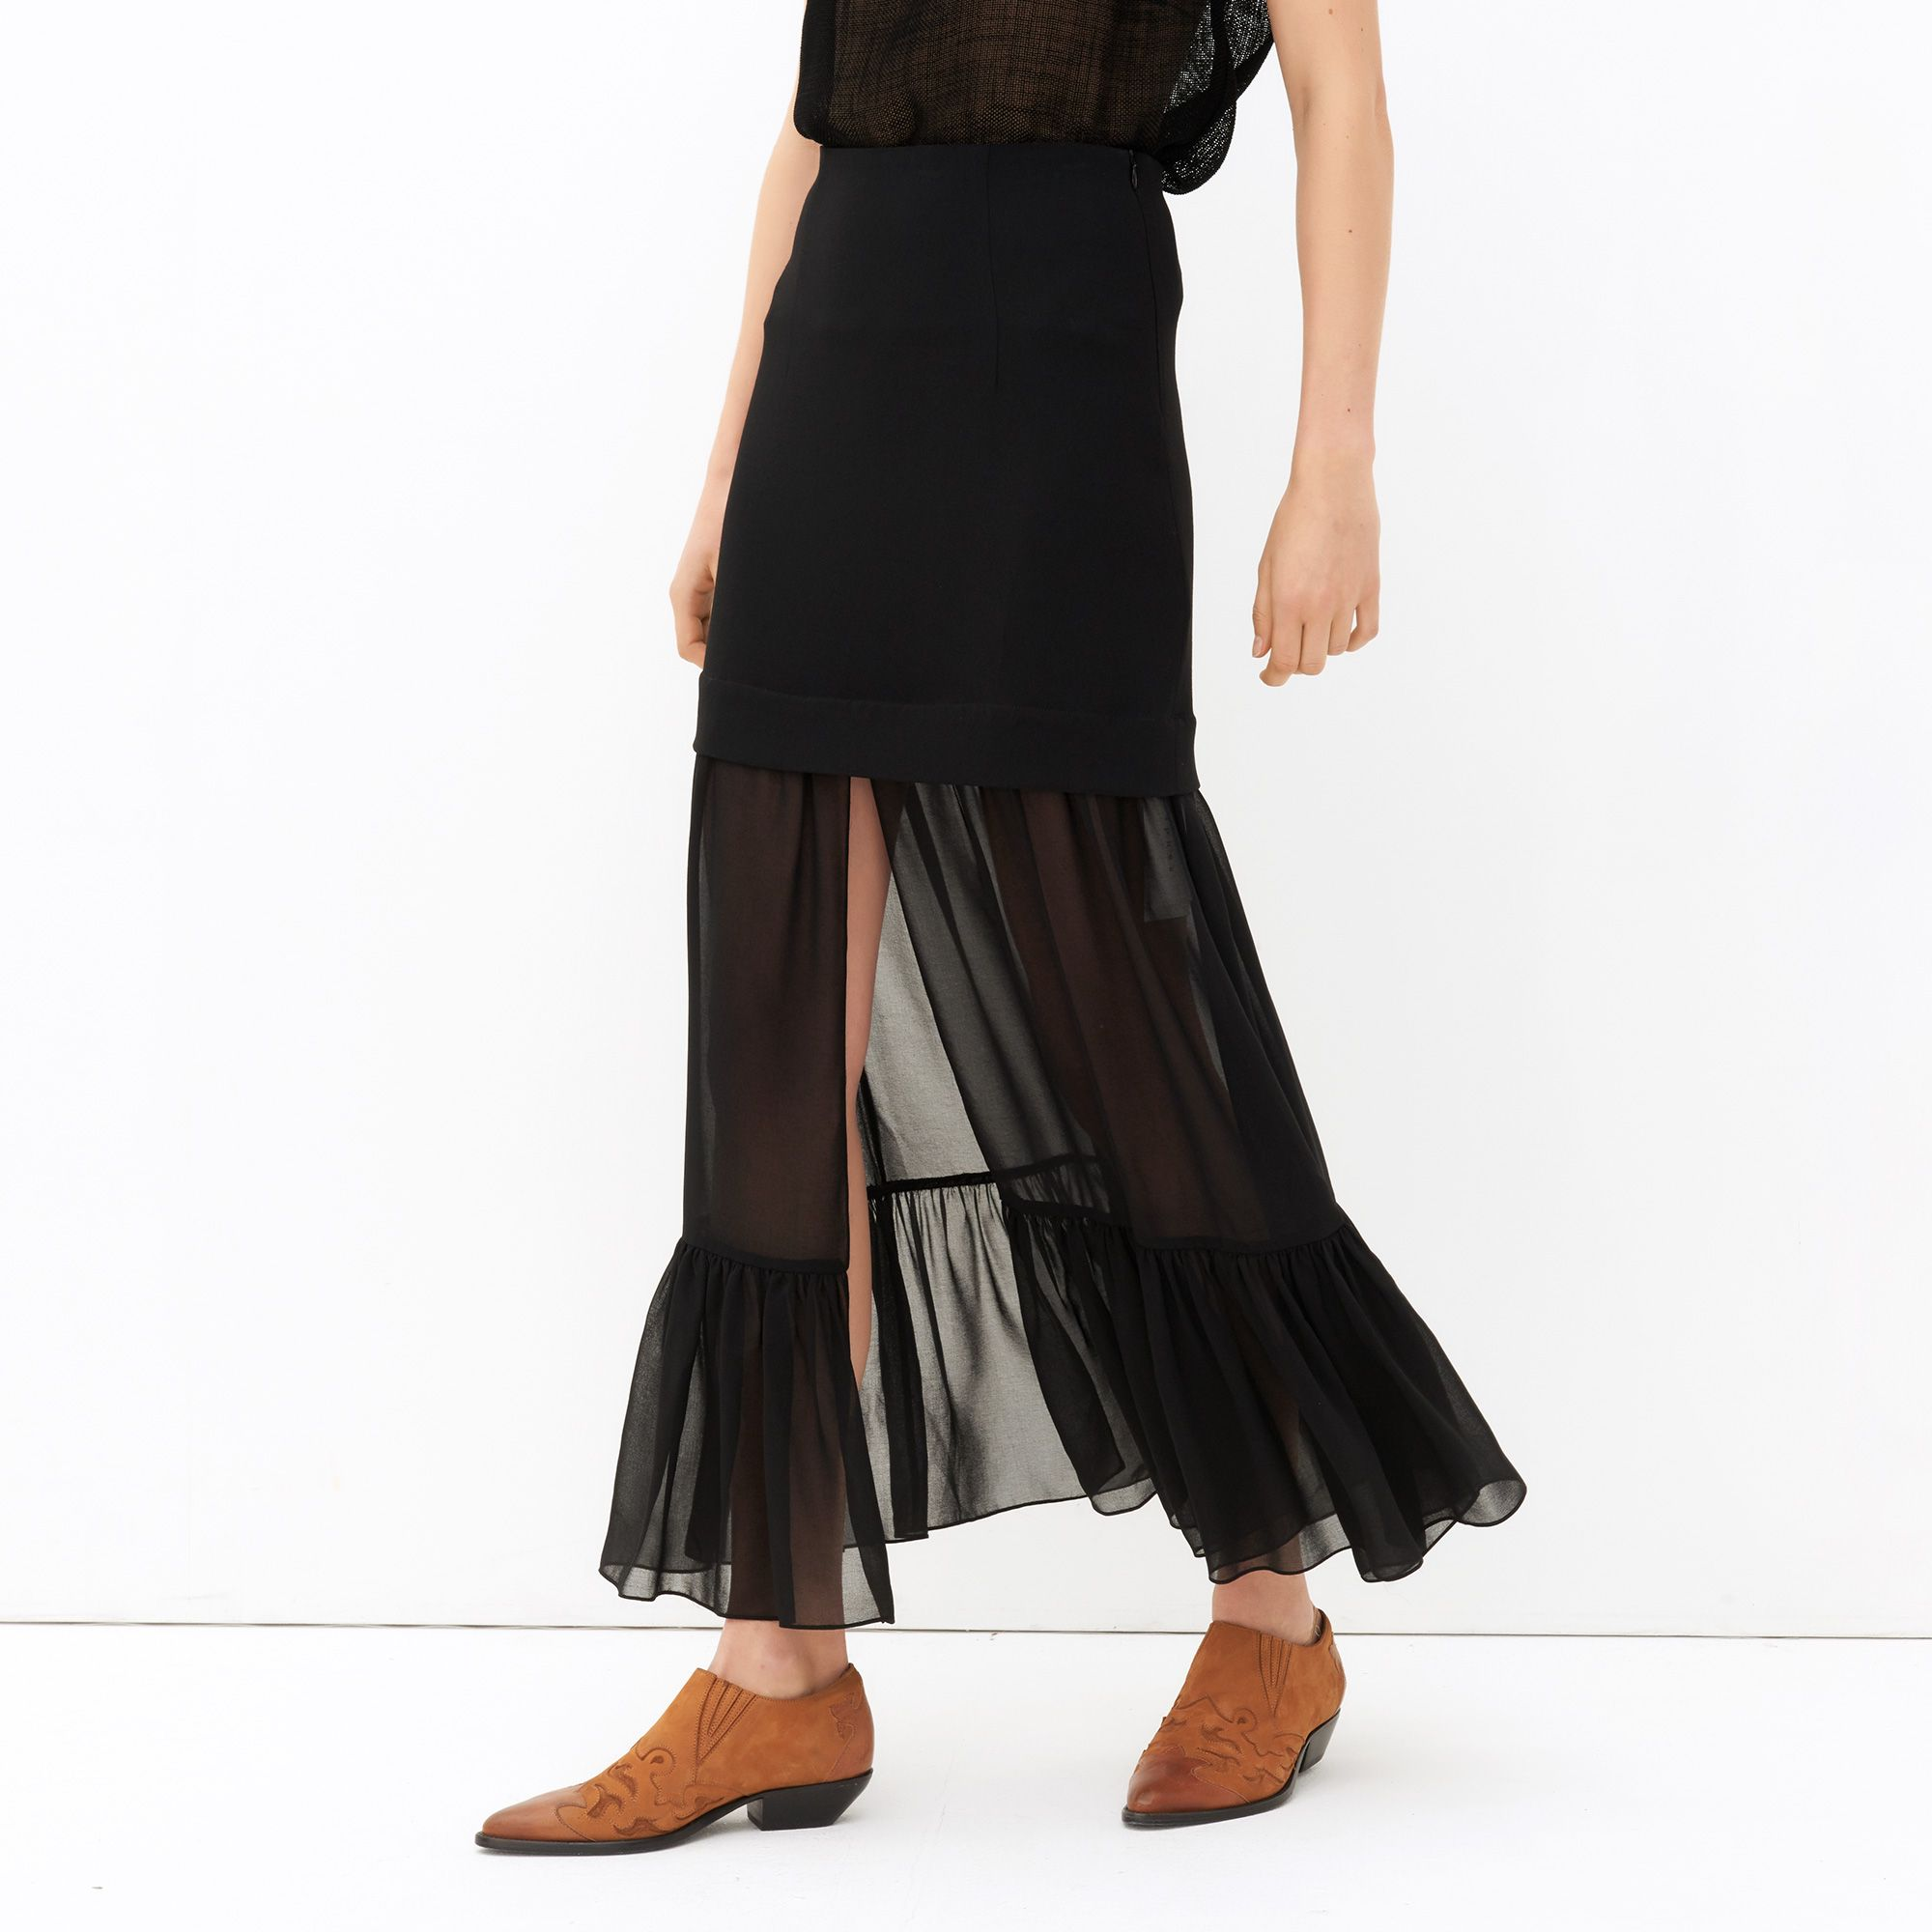 Summer New 2017 Mesh Lace See Through Transparent Sexy Womens Skirt Ruffles  Design Splice Slim Fit Faldas Woman Black Color Saia